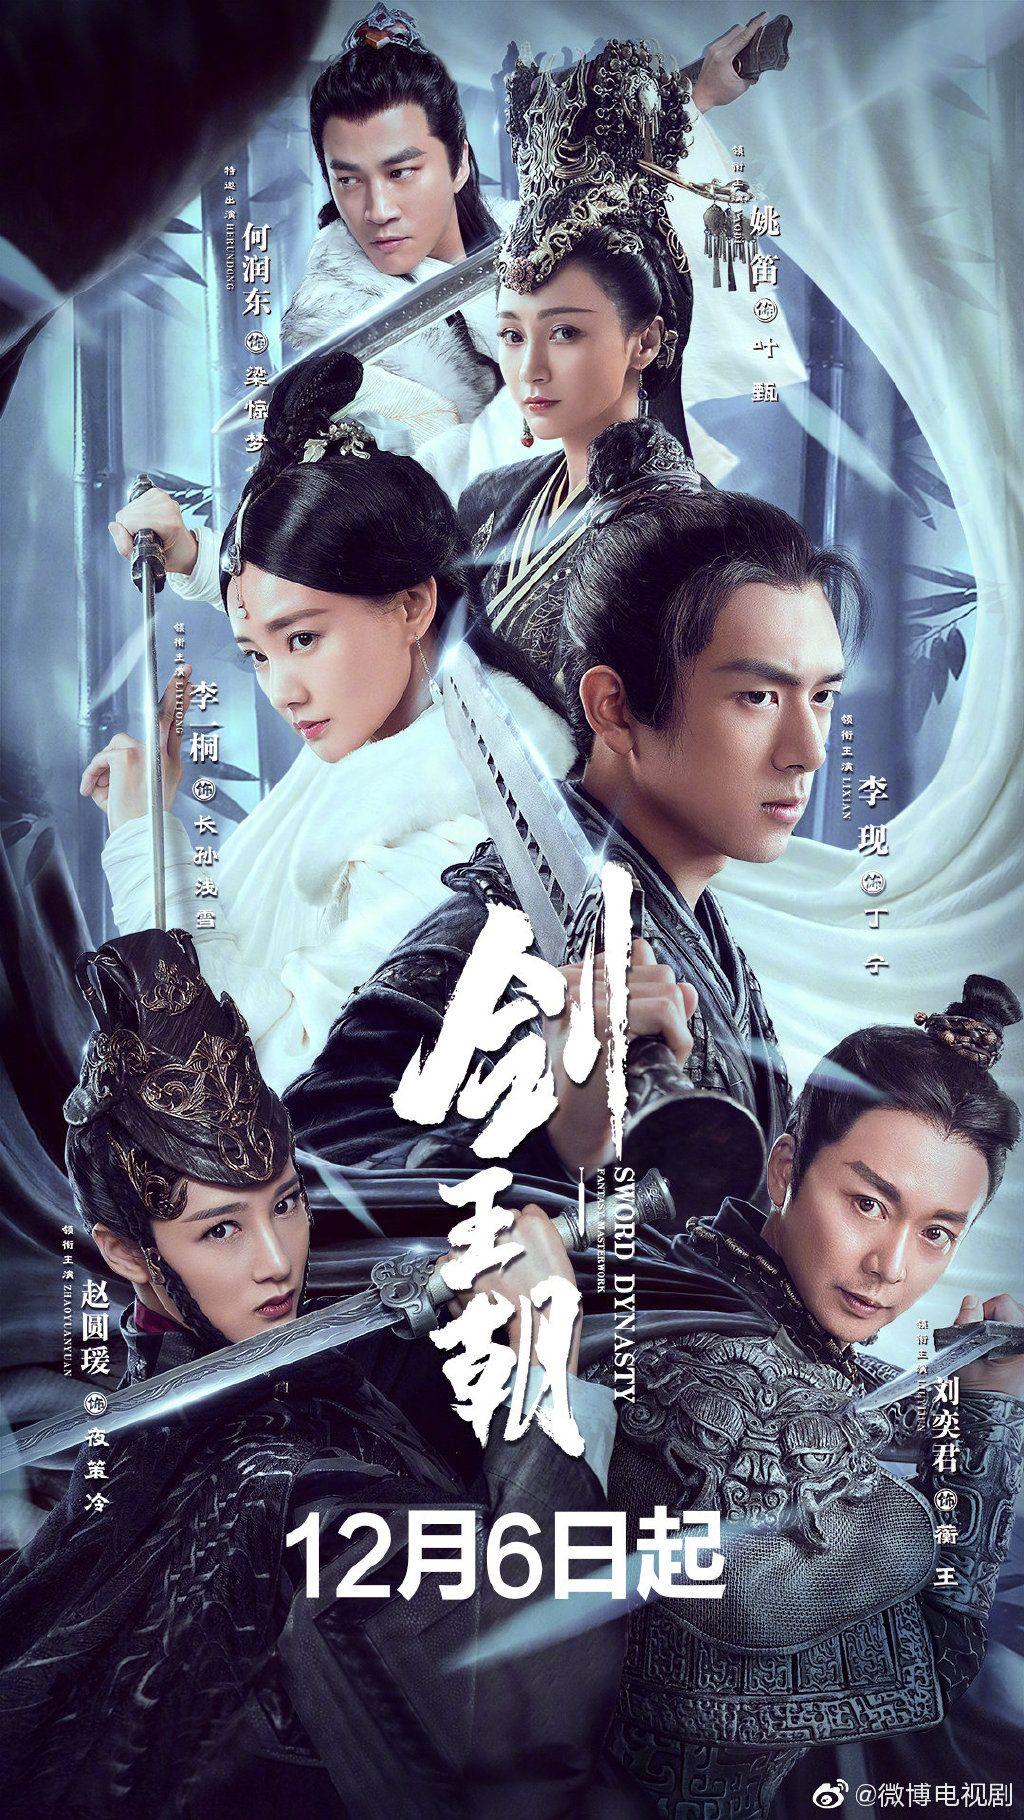 Sword Dynasty Summary Chinese movies, Sword, Drama